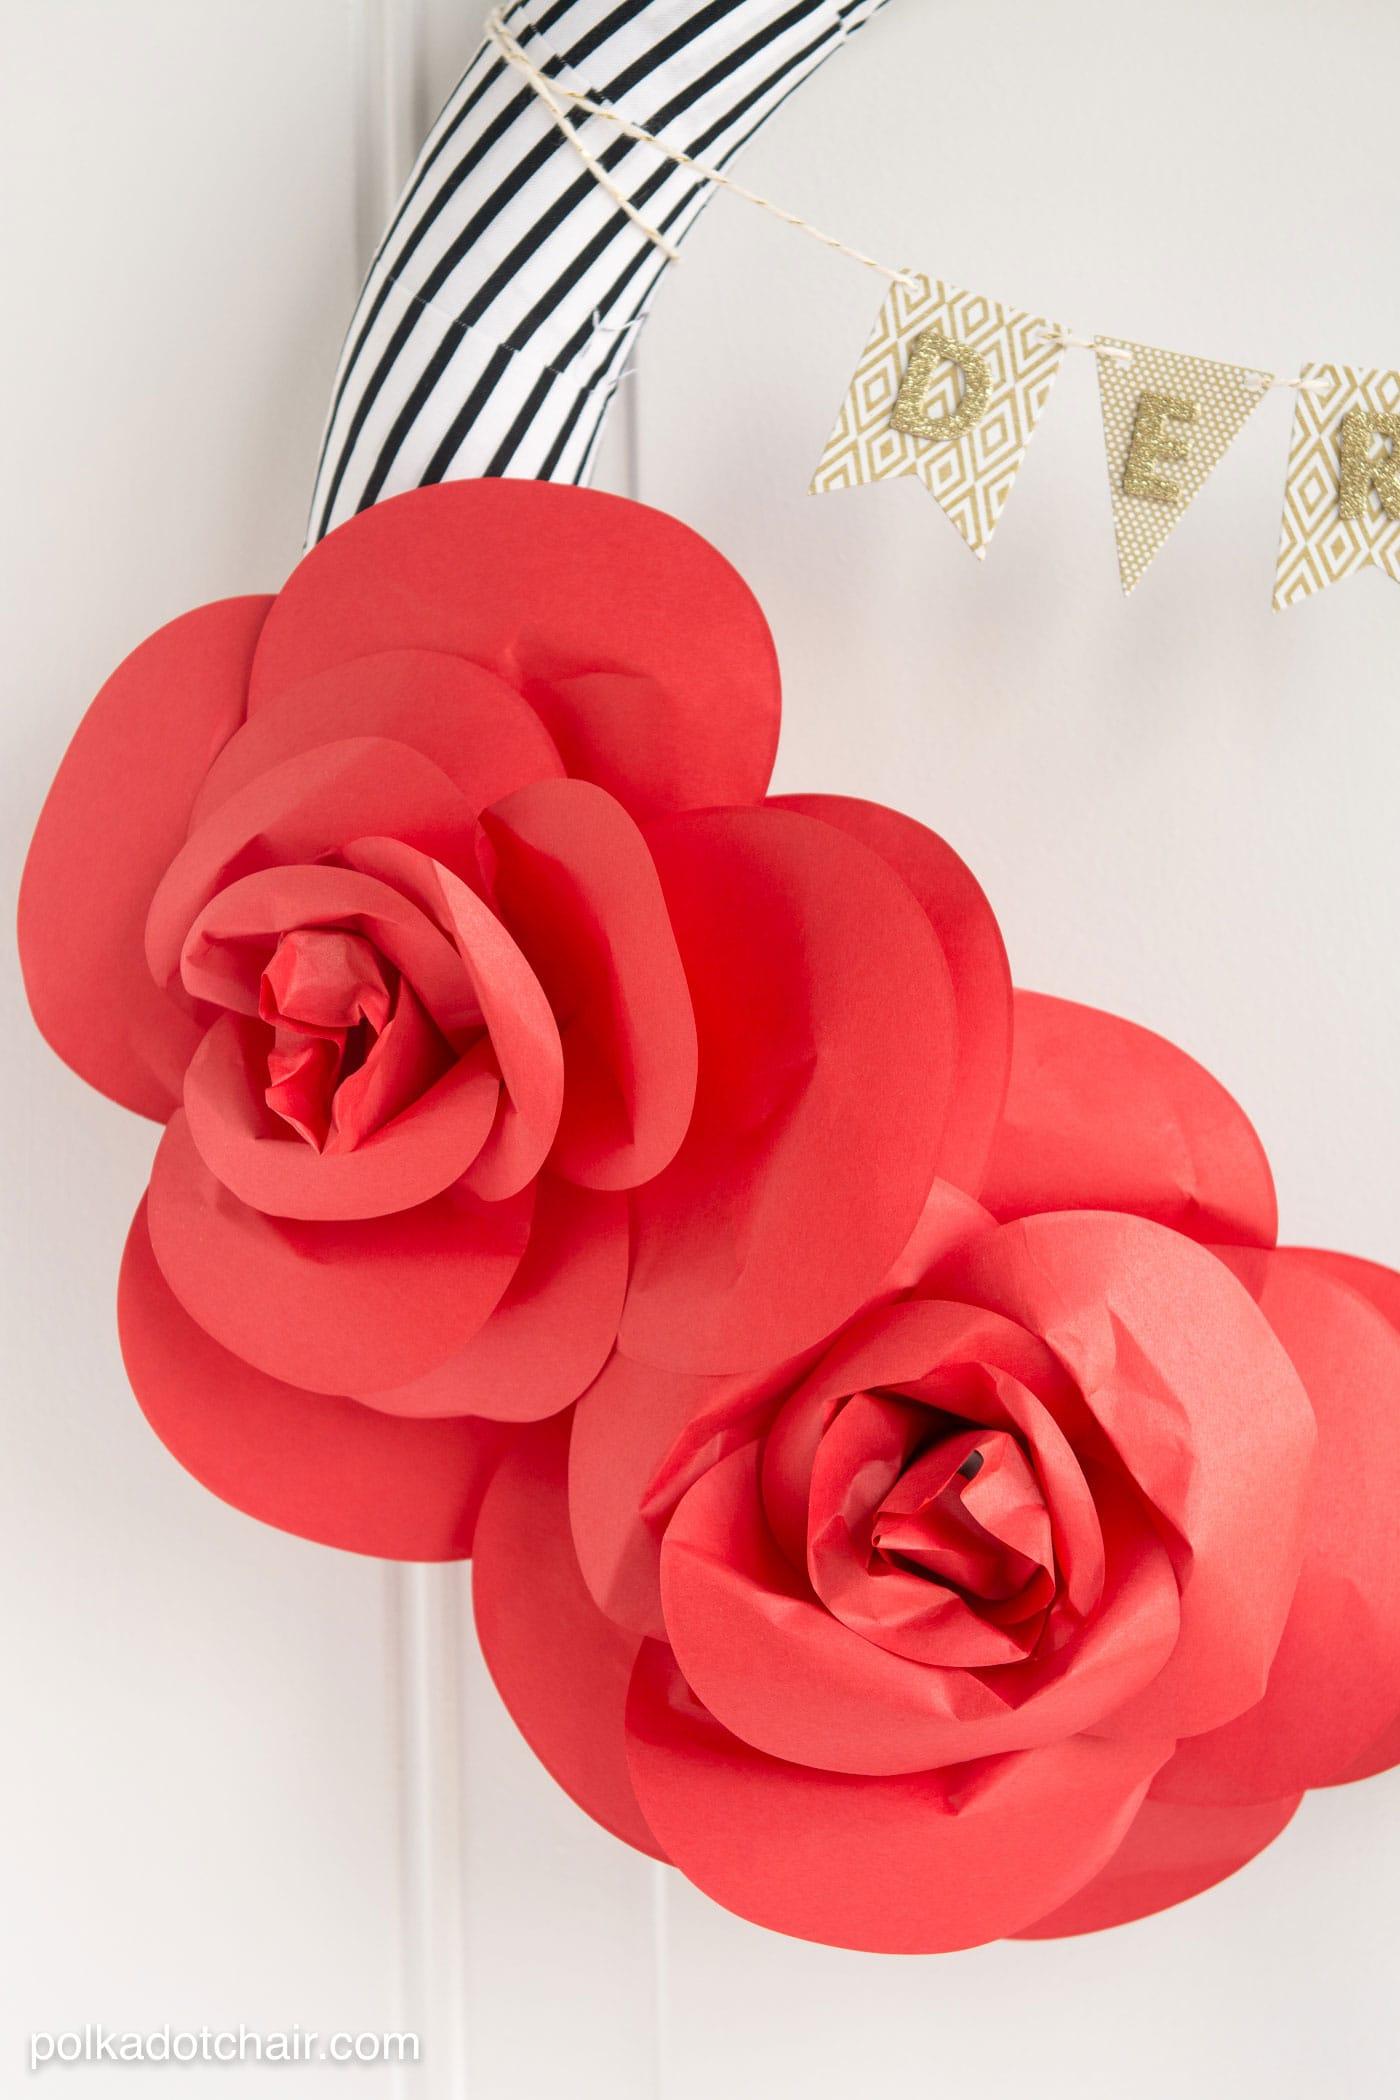 Diy Paper Flower Wreath Tutorial A Kentucky Derby Decoration Idea